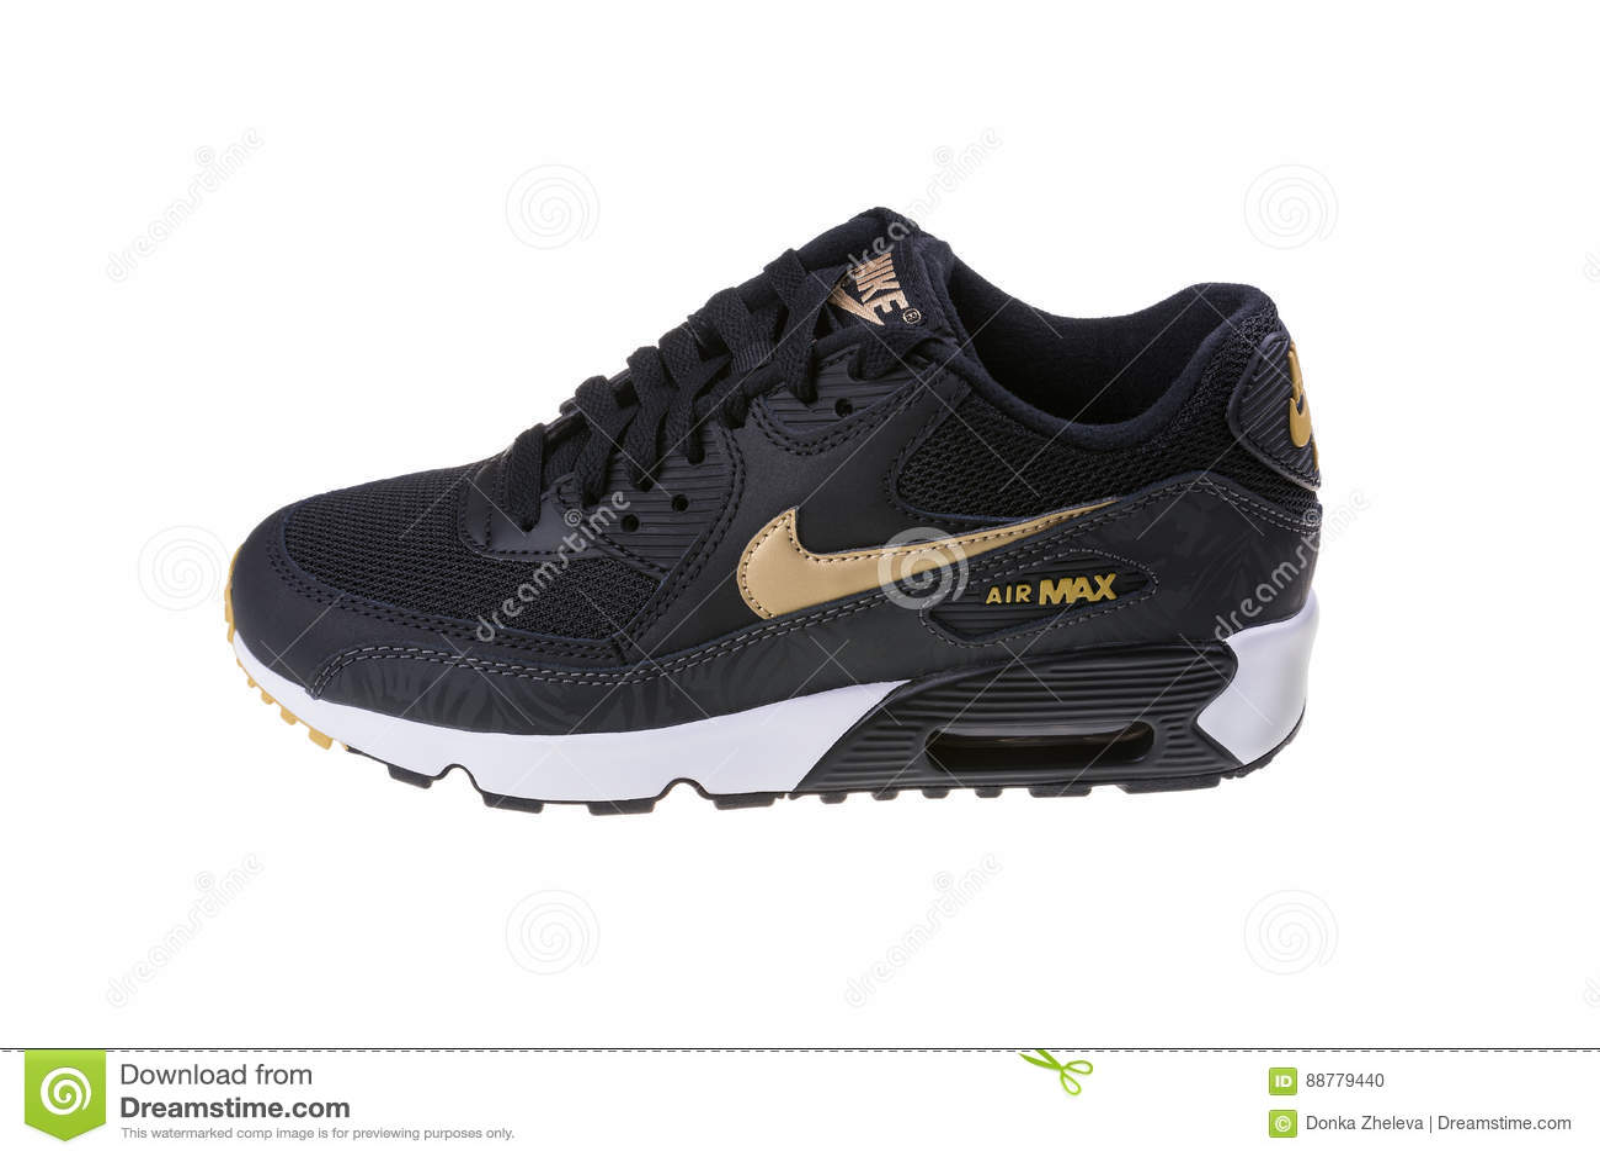 d1a1dd53e09 Εκδοτική. BURGAS, ΒΟΥΛΓΑΡΊΑ - 29 ΔΕΚΕΜΒΡΊΟΥ 2016: ΑΝΩΤΑΤΑ παπούτσια γυναικών  ` s αέρα της Nike